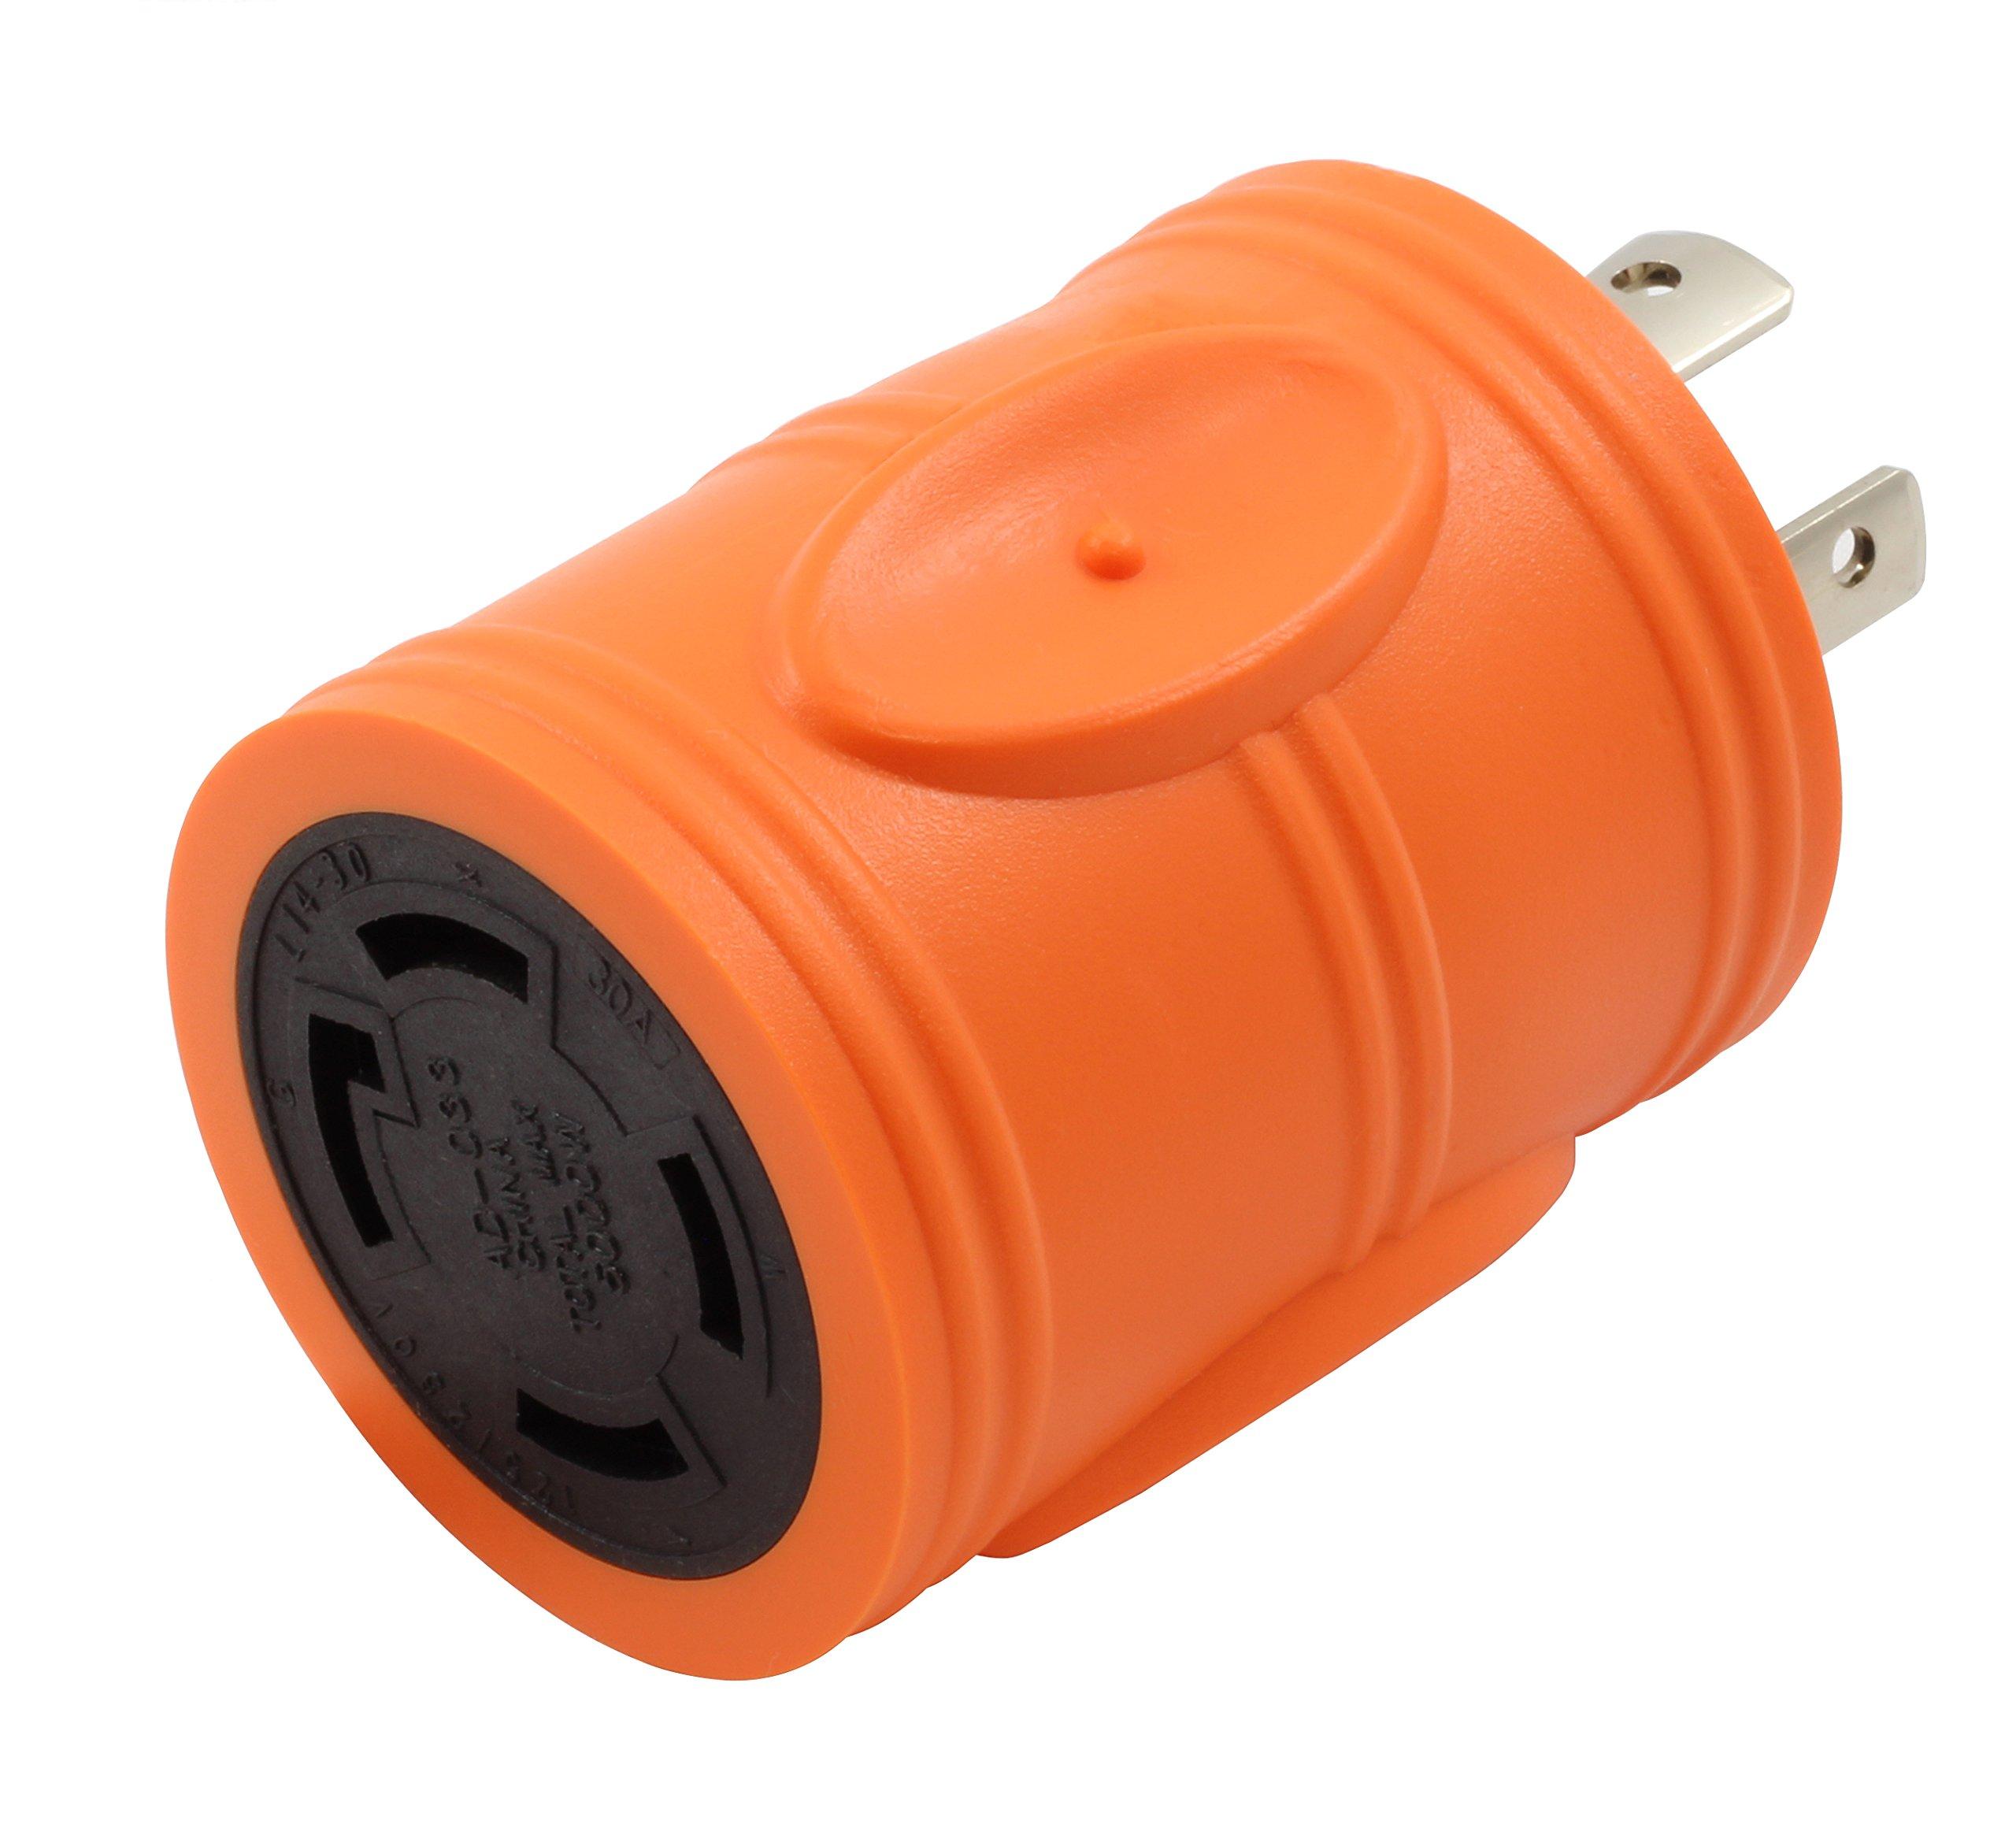 AC WORKS [ADL1420L1430] 20Amp 4 Prong 125/250Volt L14-20P Locking Plug to L14-30R 30Amp 4Prong 125/250Volt Locking Female Connector Adapter by AC WORKS (Image #1)